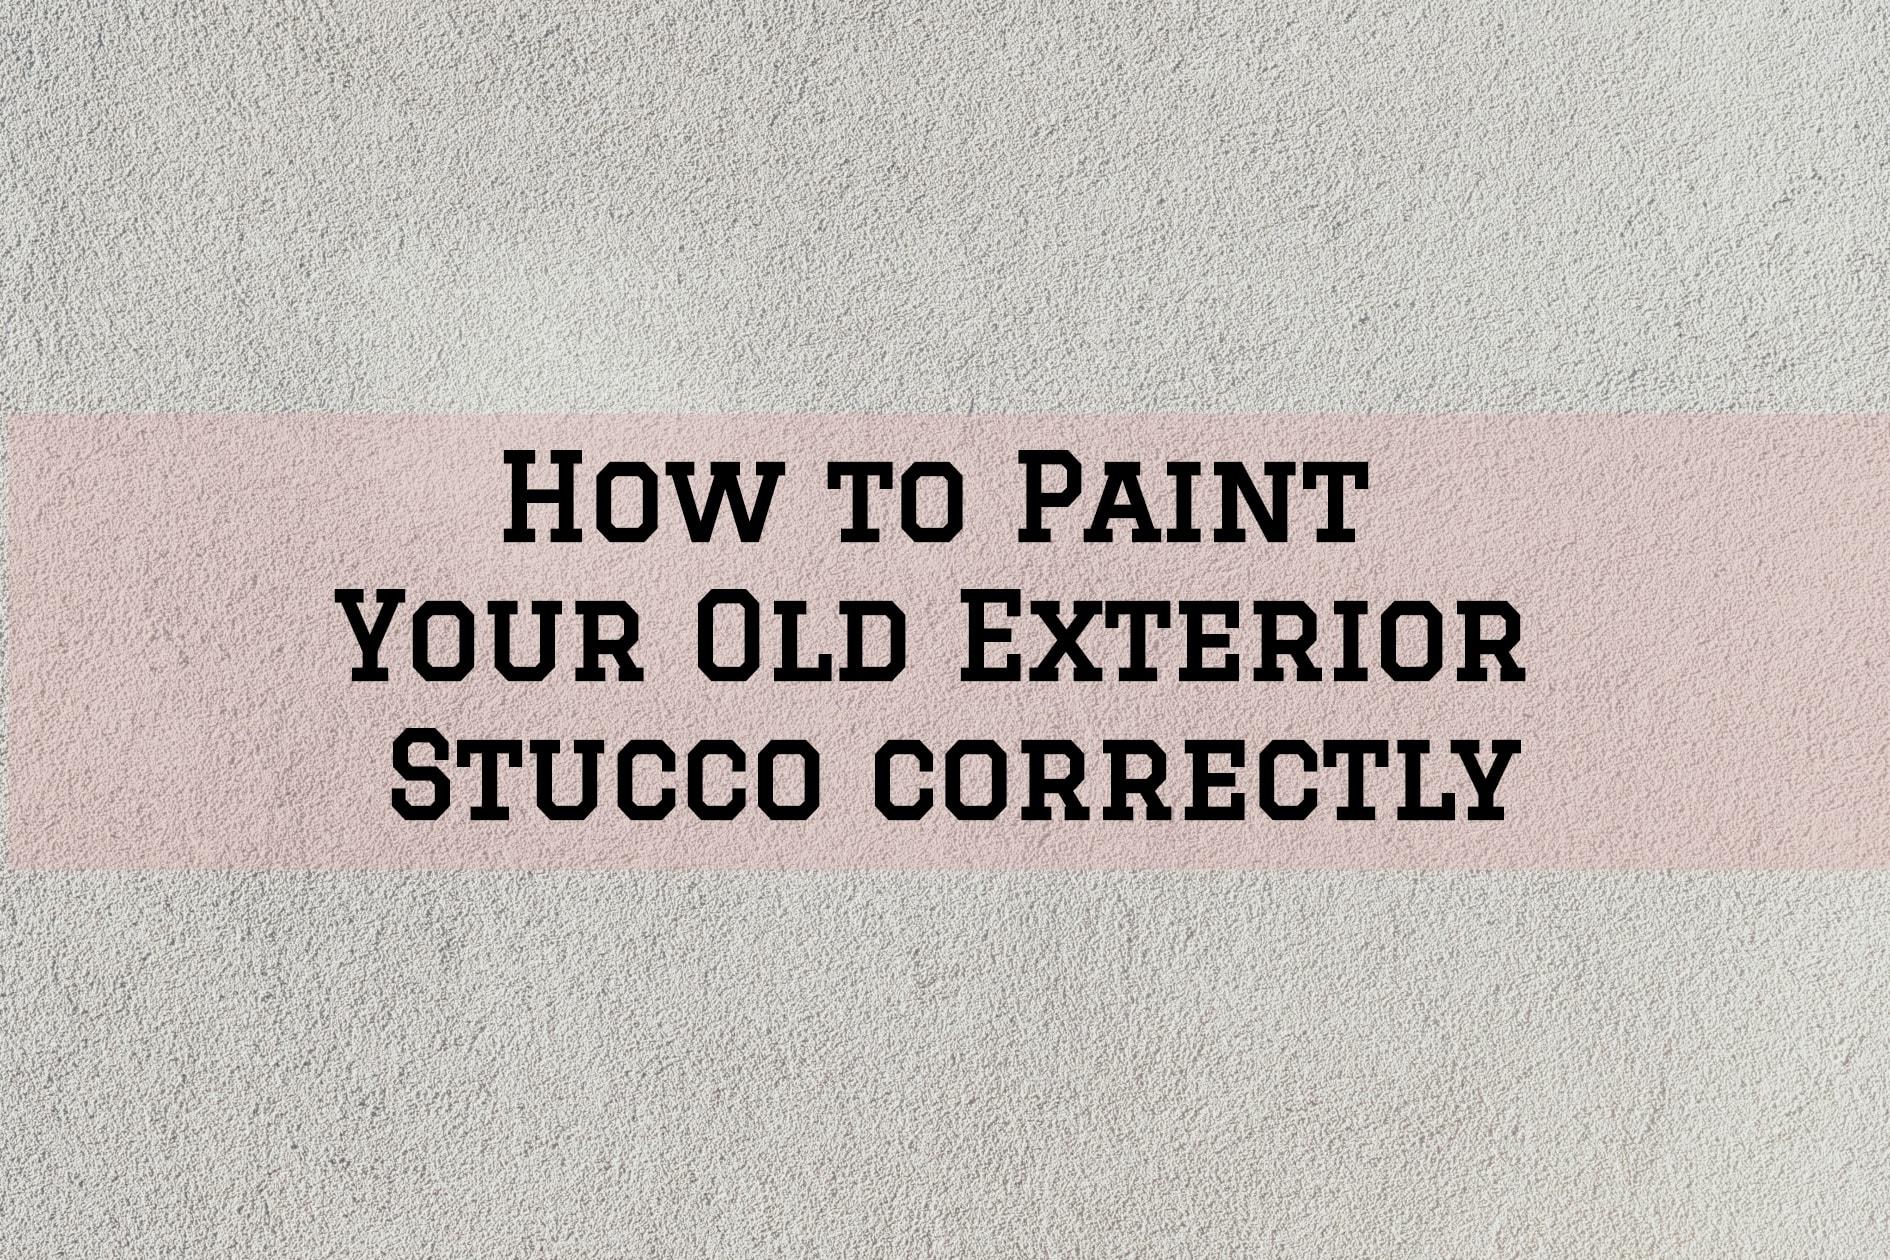 painting stucco walls, stucco walls